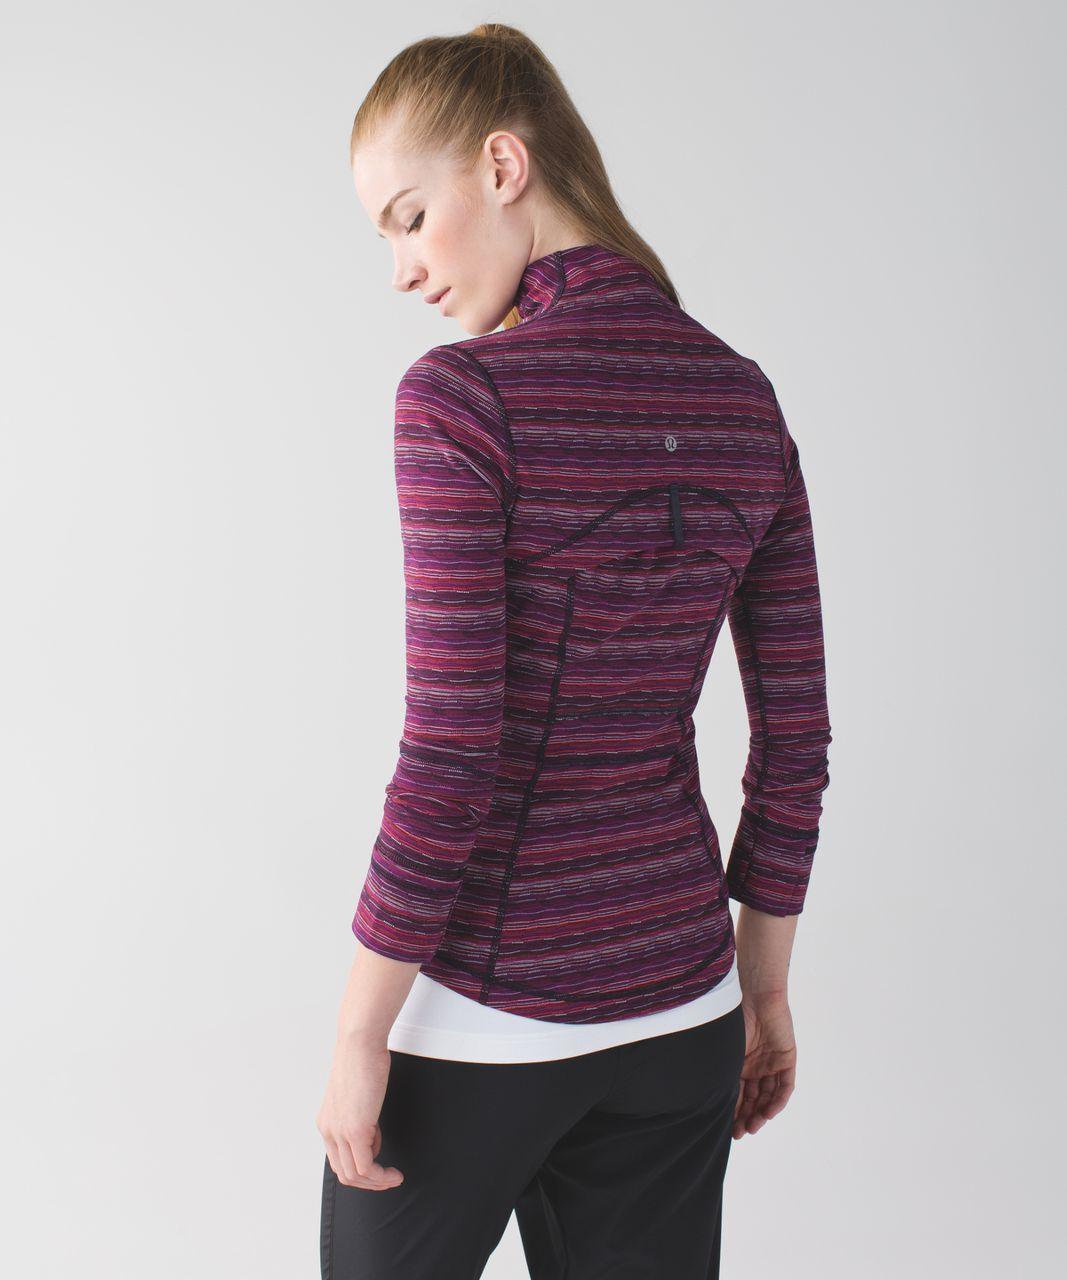 Lululemon Define Jacket - Space Dye Twist Regal Plum Alarming